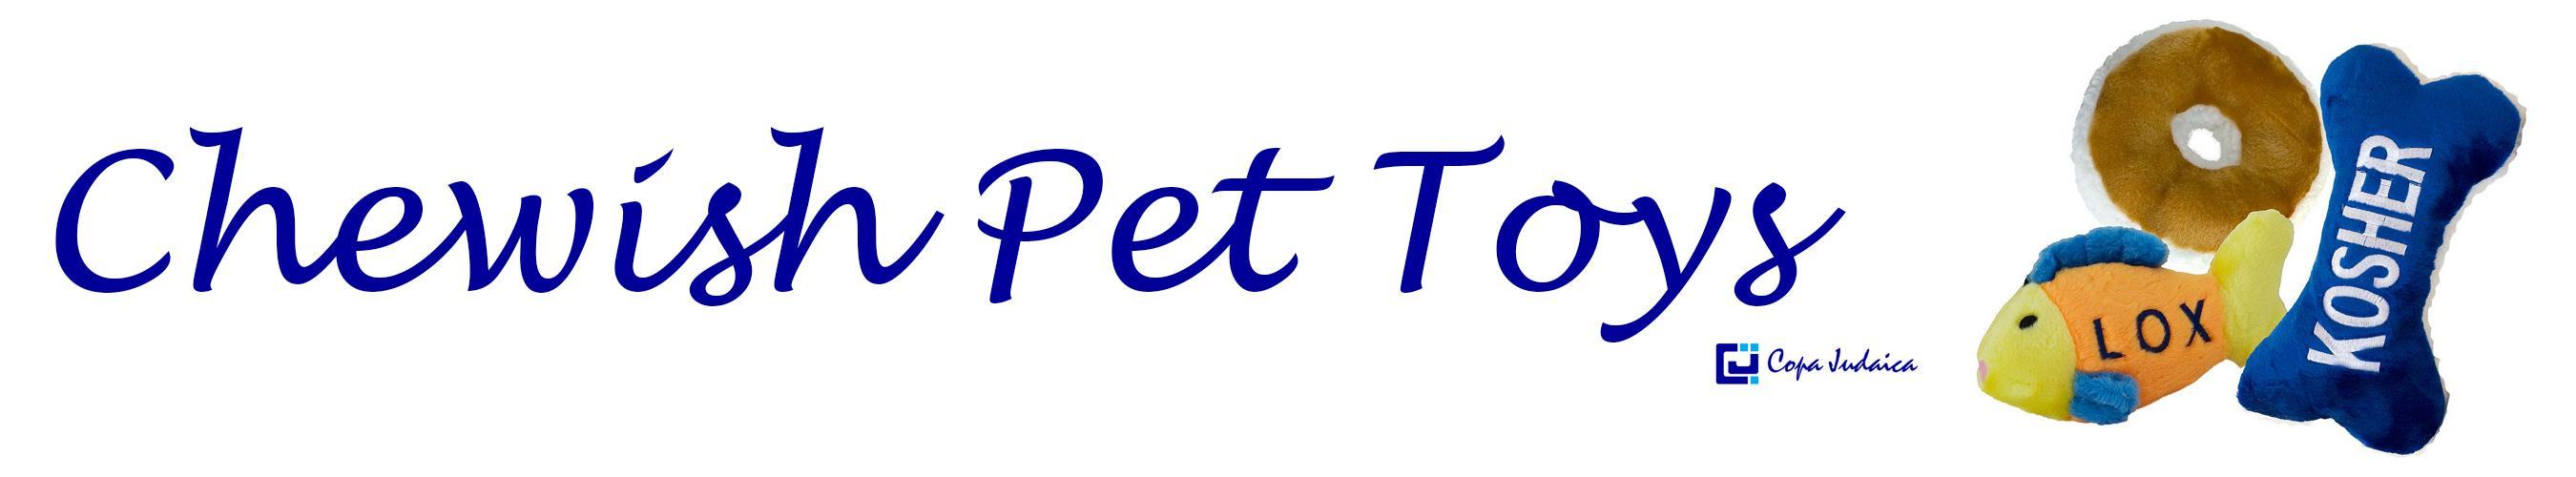 Chewish Pet Toys / Copa Judaica